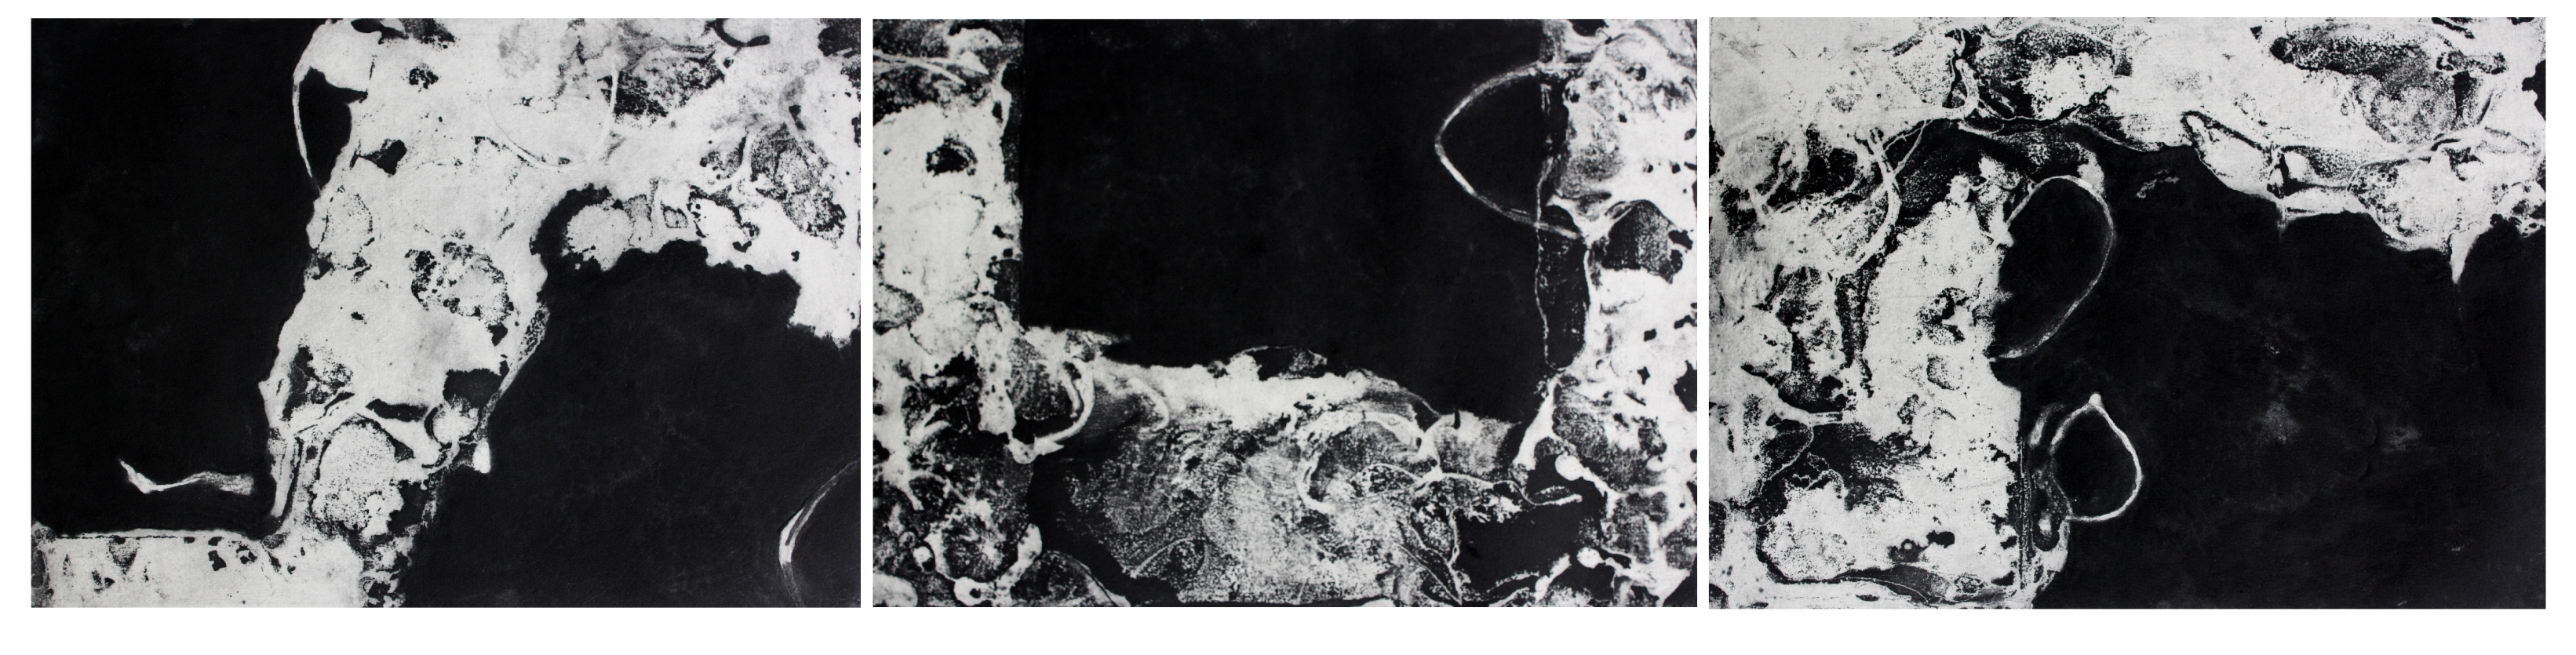 Black Light triptych